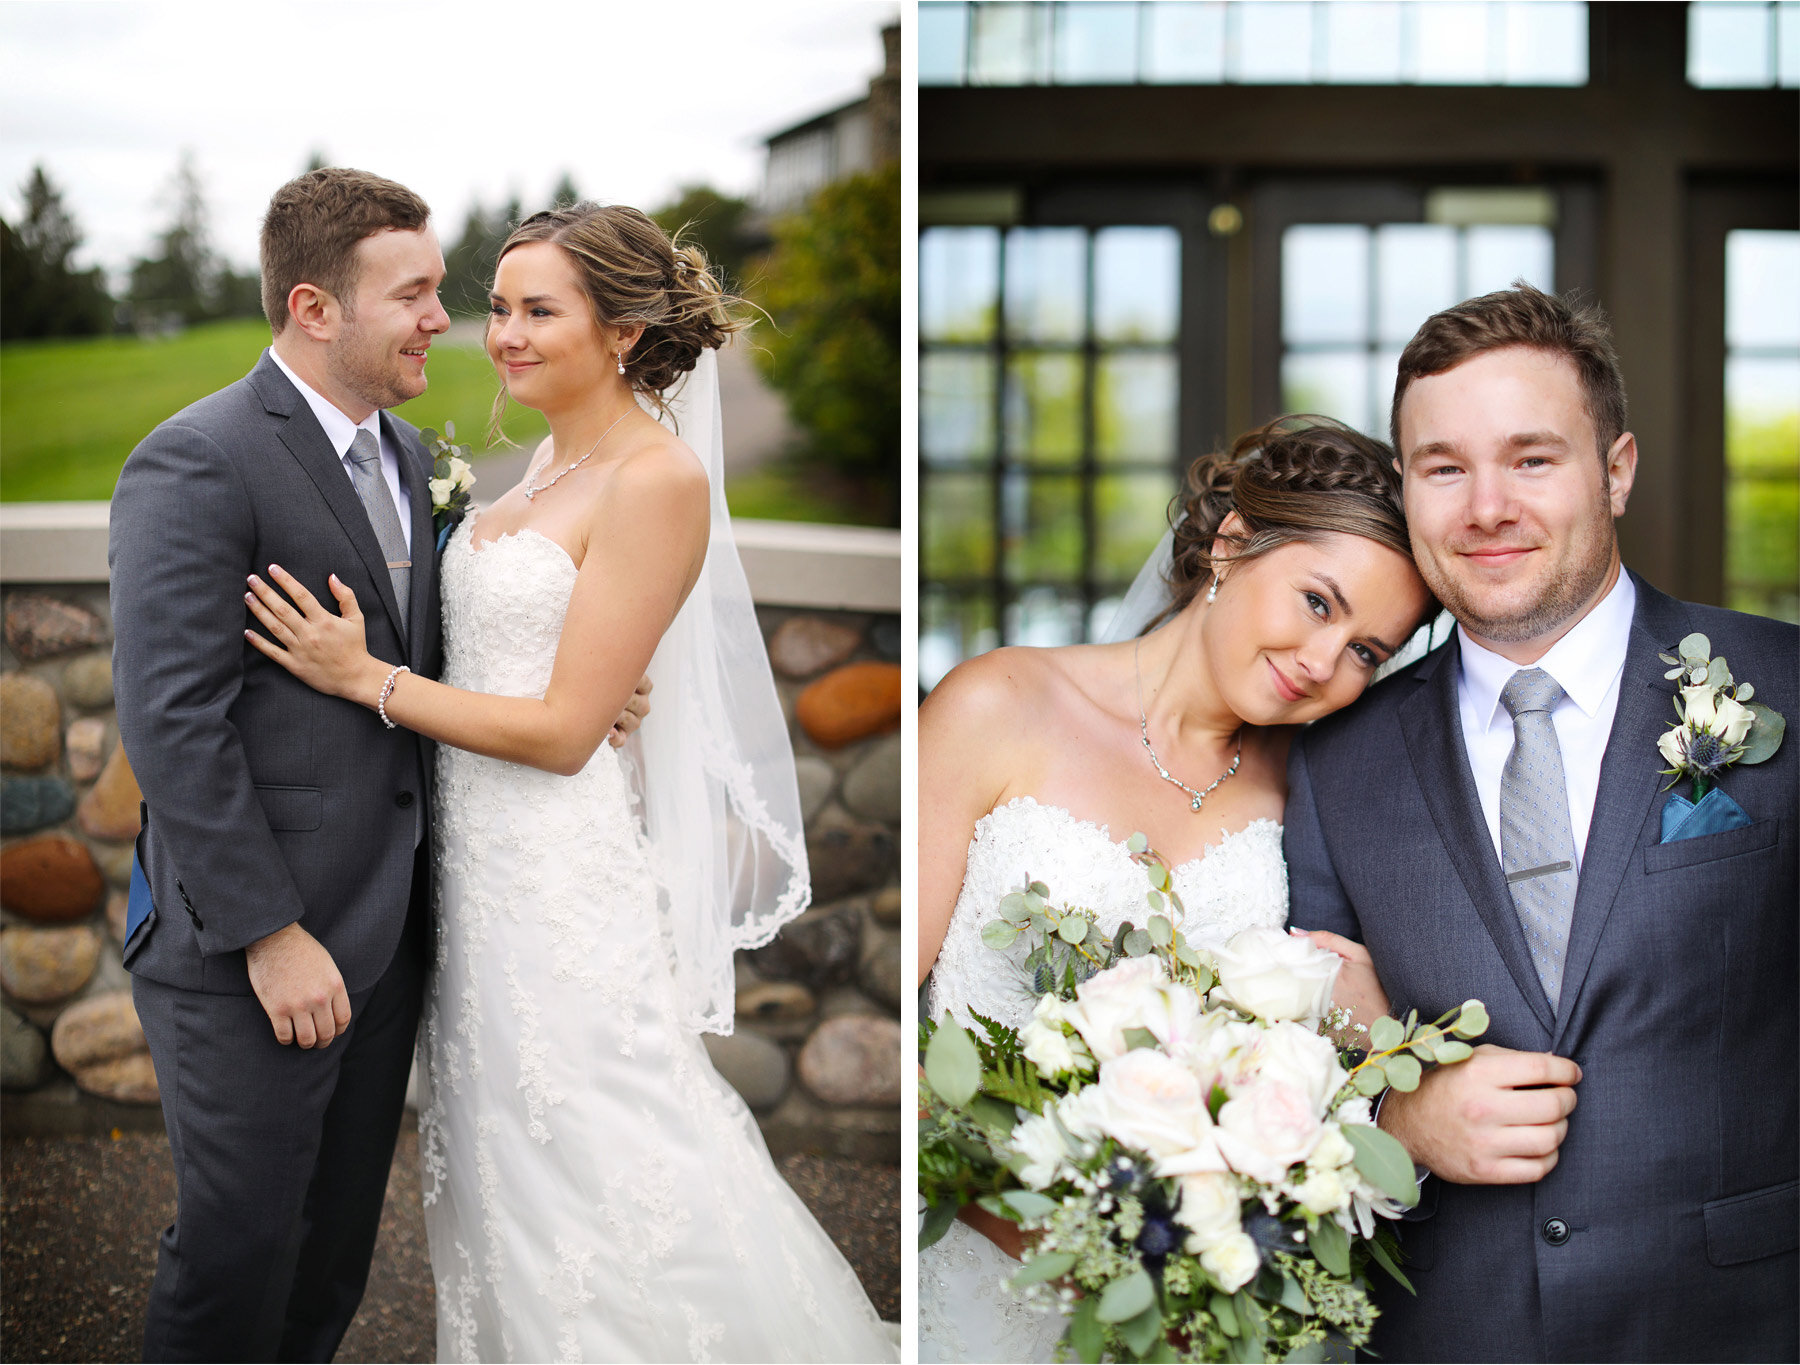 03-Vick-Photography-Minneapolis-Minnesota-Wedding-Rush-Creek-Golf-Club-Groom-Bride-First-Look-Amanda-and-Michael.jpg